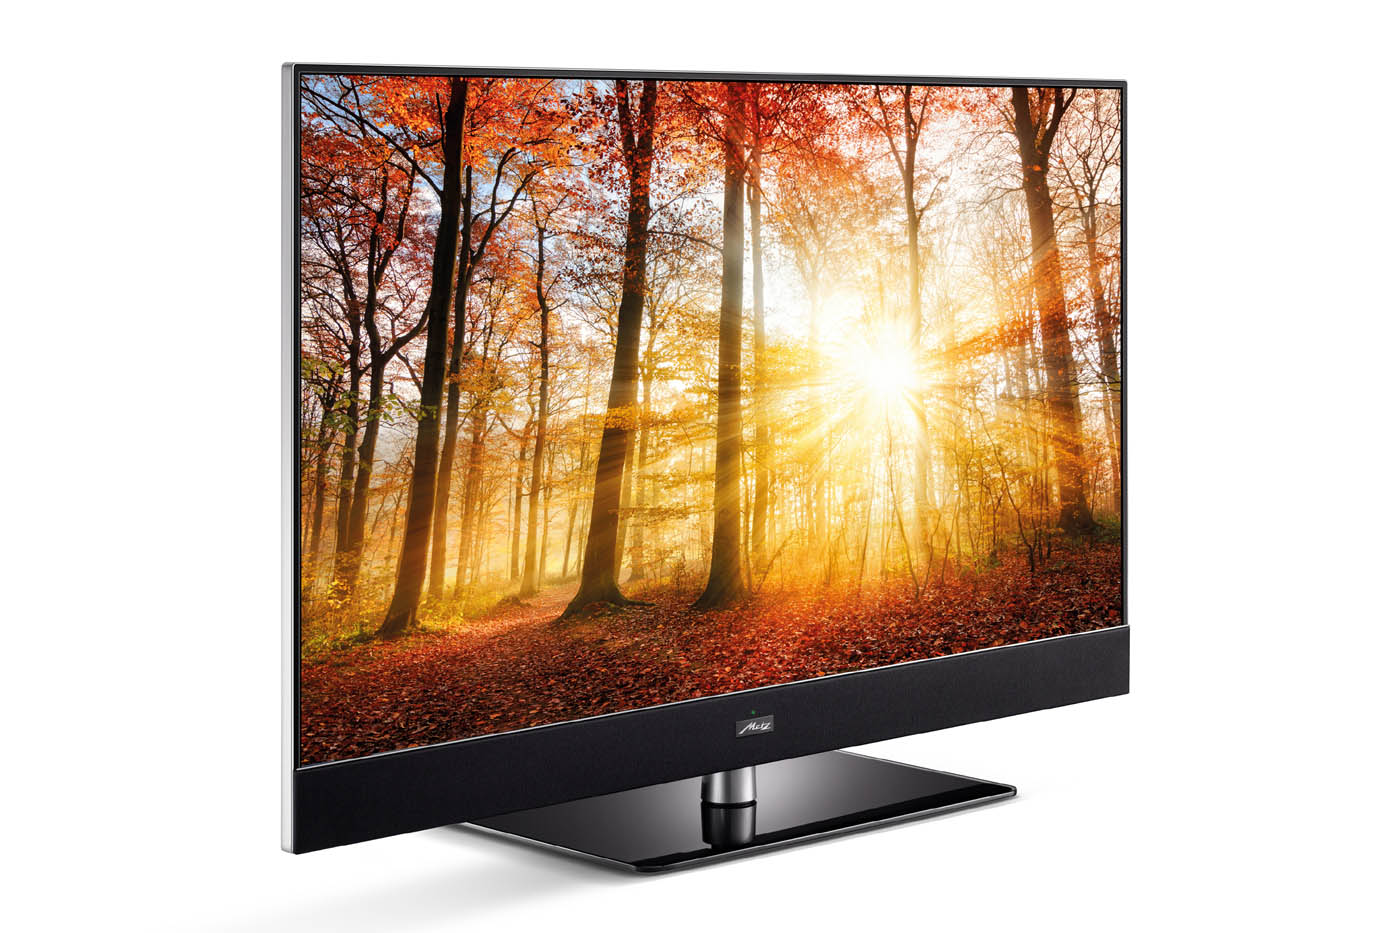 Metz Micos UHD TV 200 Euro Rabatt